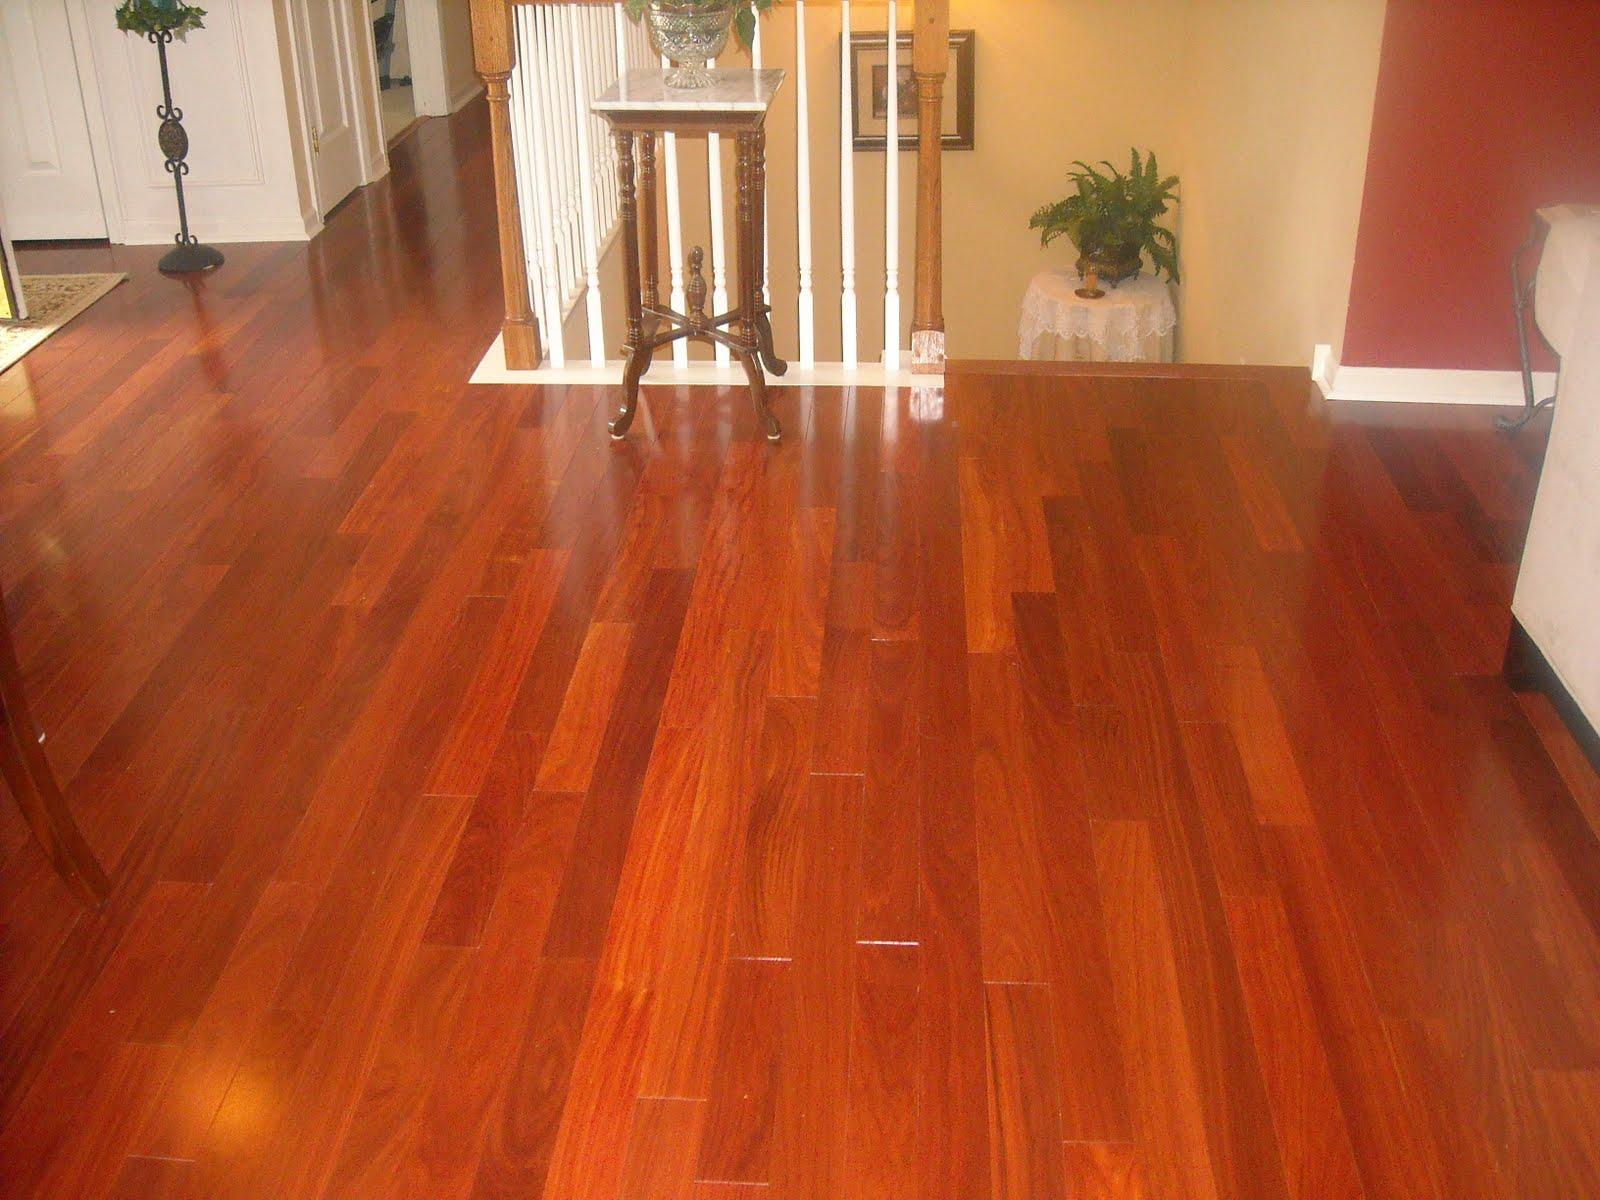 Santos mahogany hardwood flooring ideas home